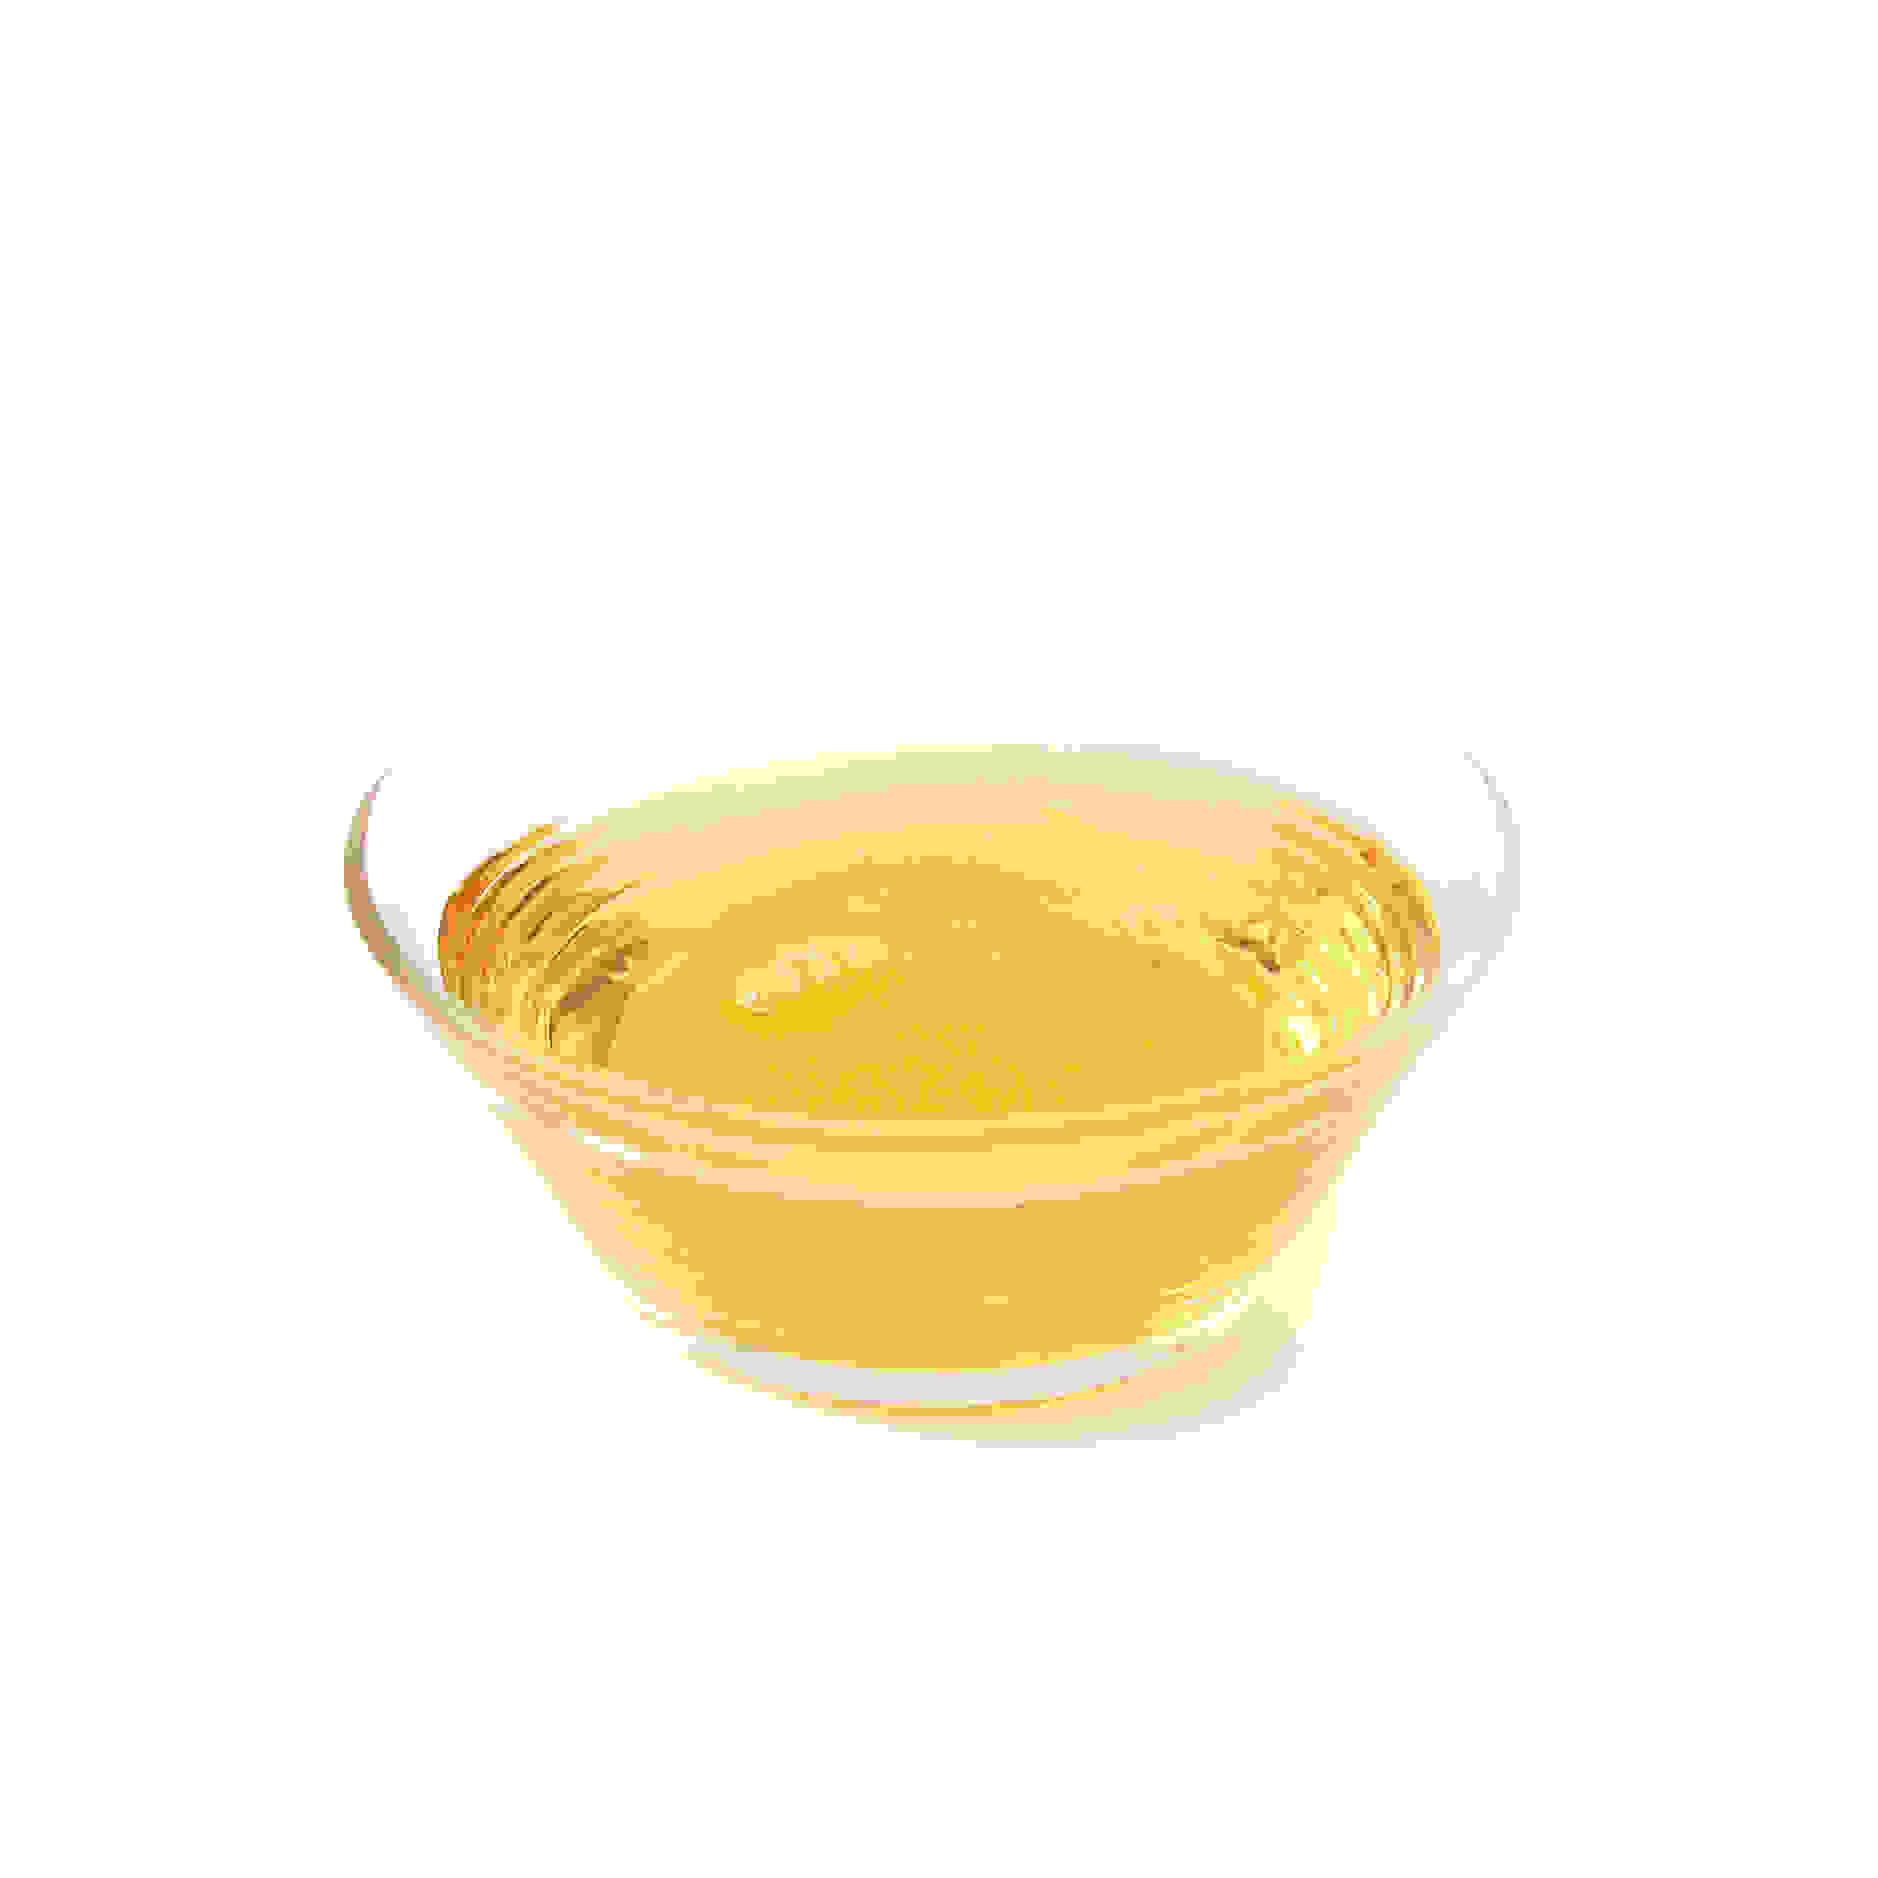 Sodium Cocoamphoacetate